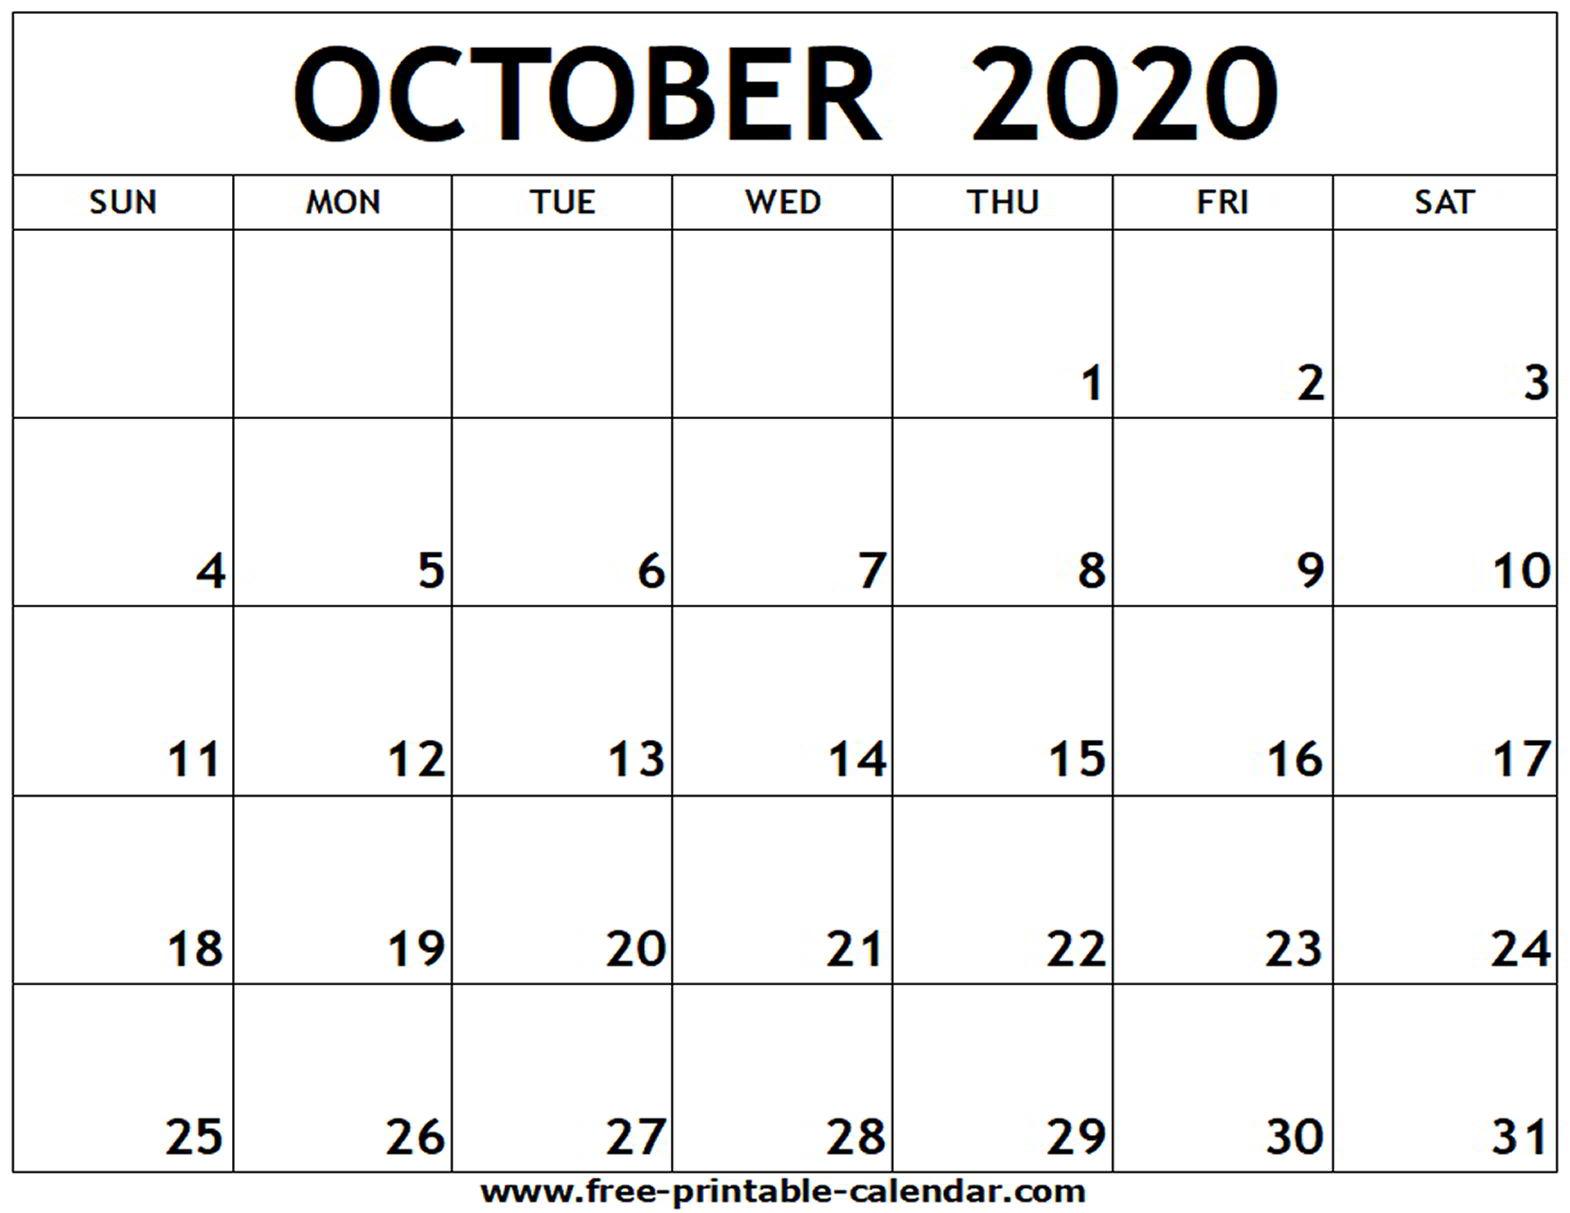 Printable Calendar 2020 October - Yeter.wpart.co